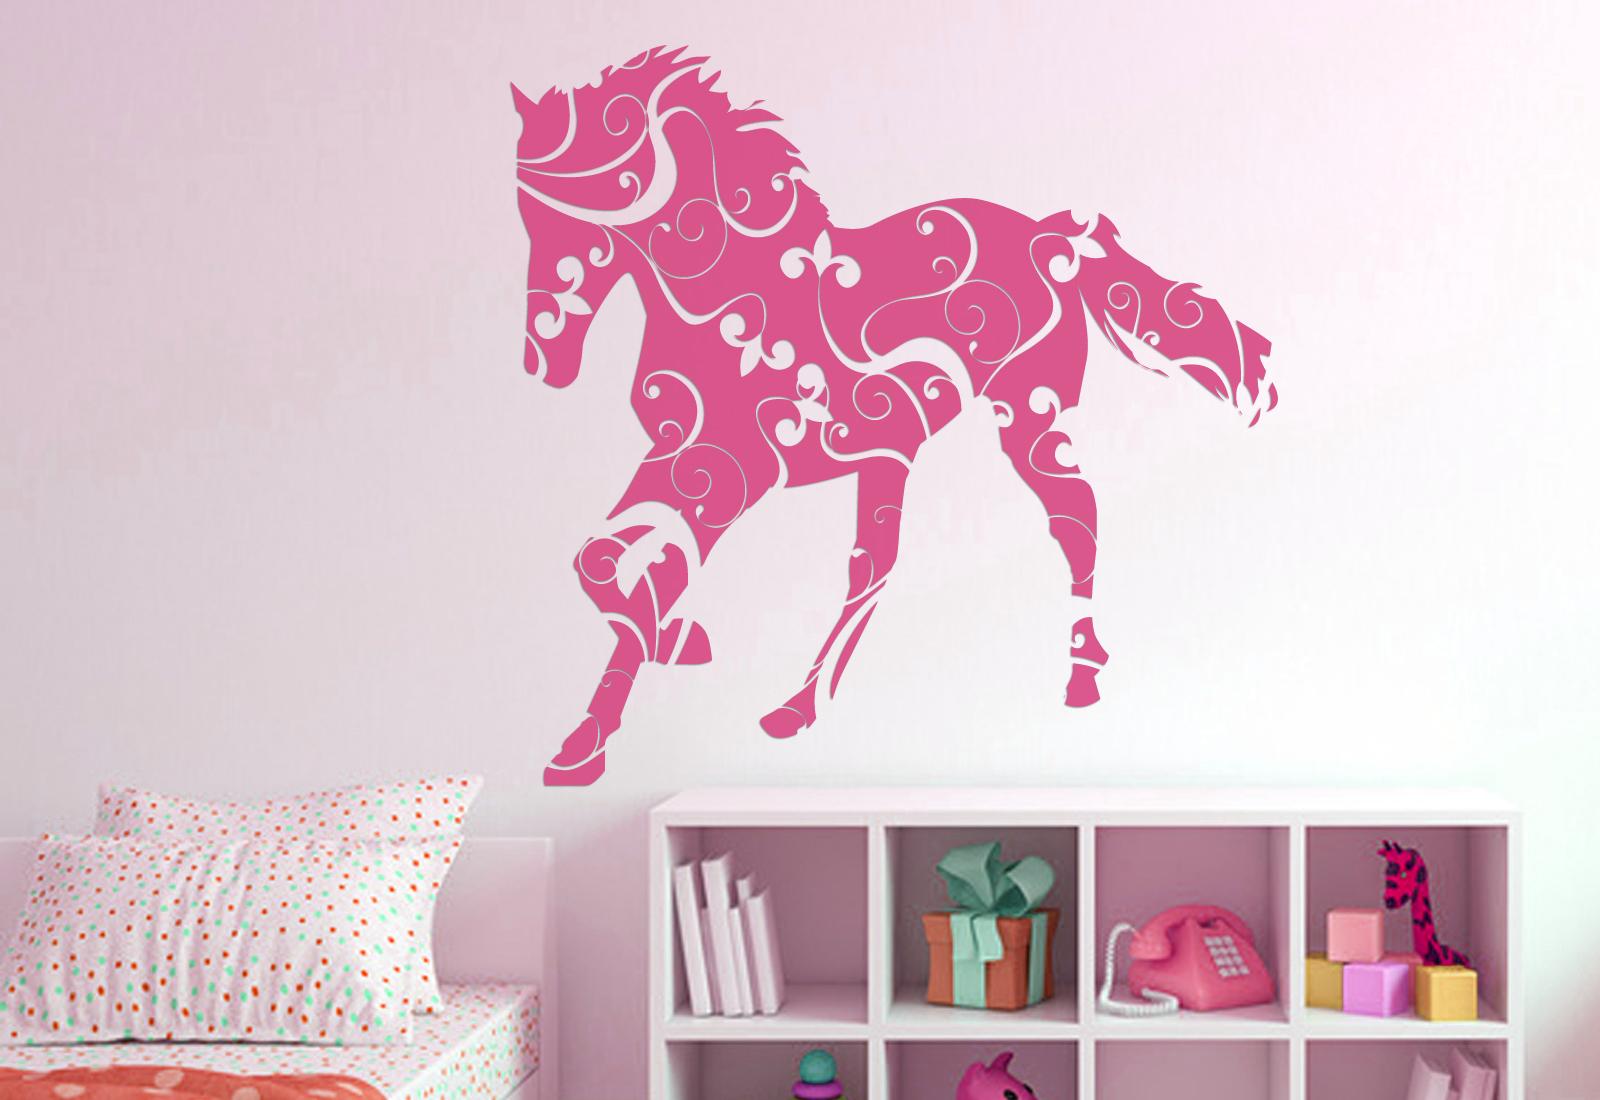 Full Size of Kinderzimmer Pferd Wandtattoo Ab 20 Regal Sofa Weiß Regale Kinderzimmer Kinderzimmer Pferd